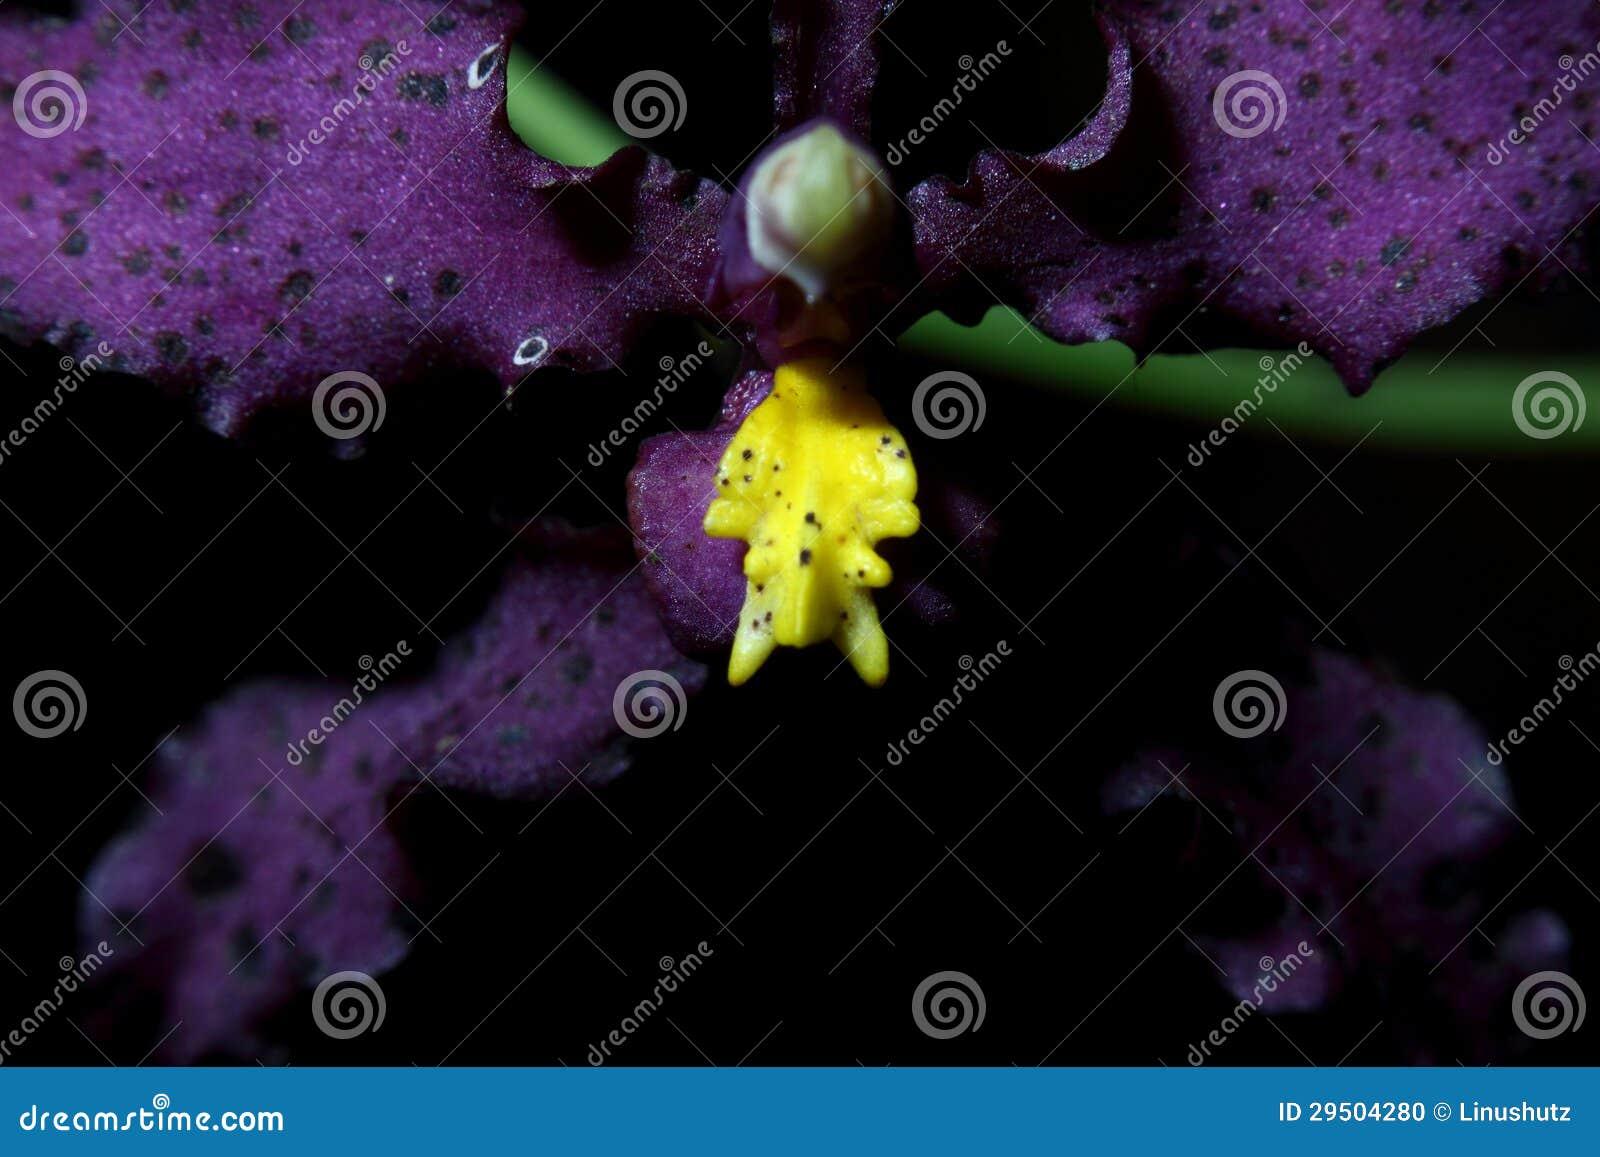 Zeldzame Orchidee